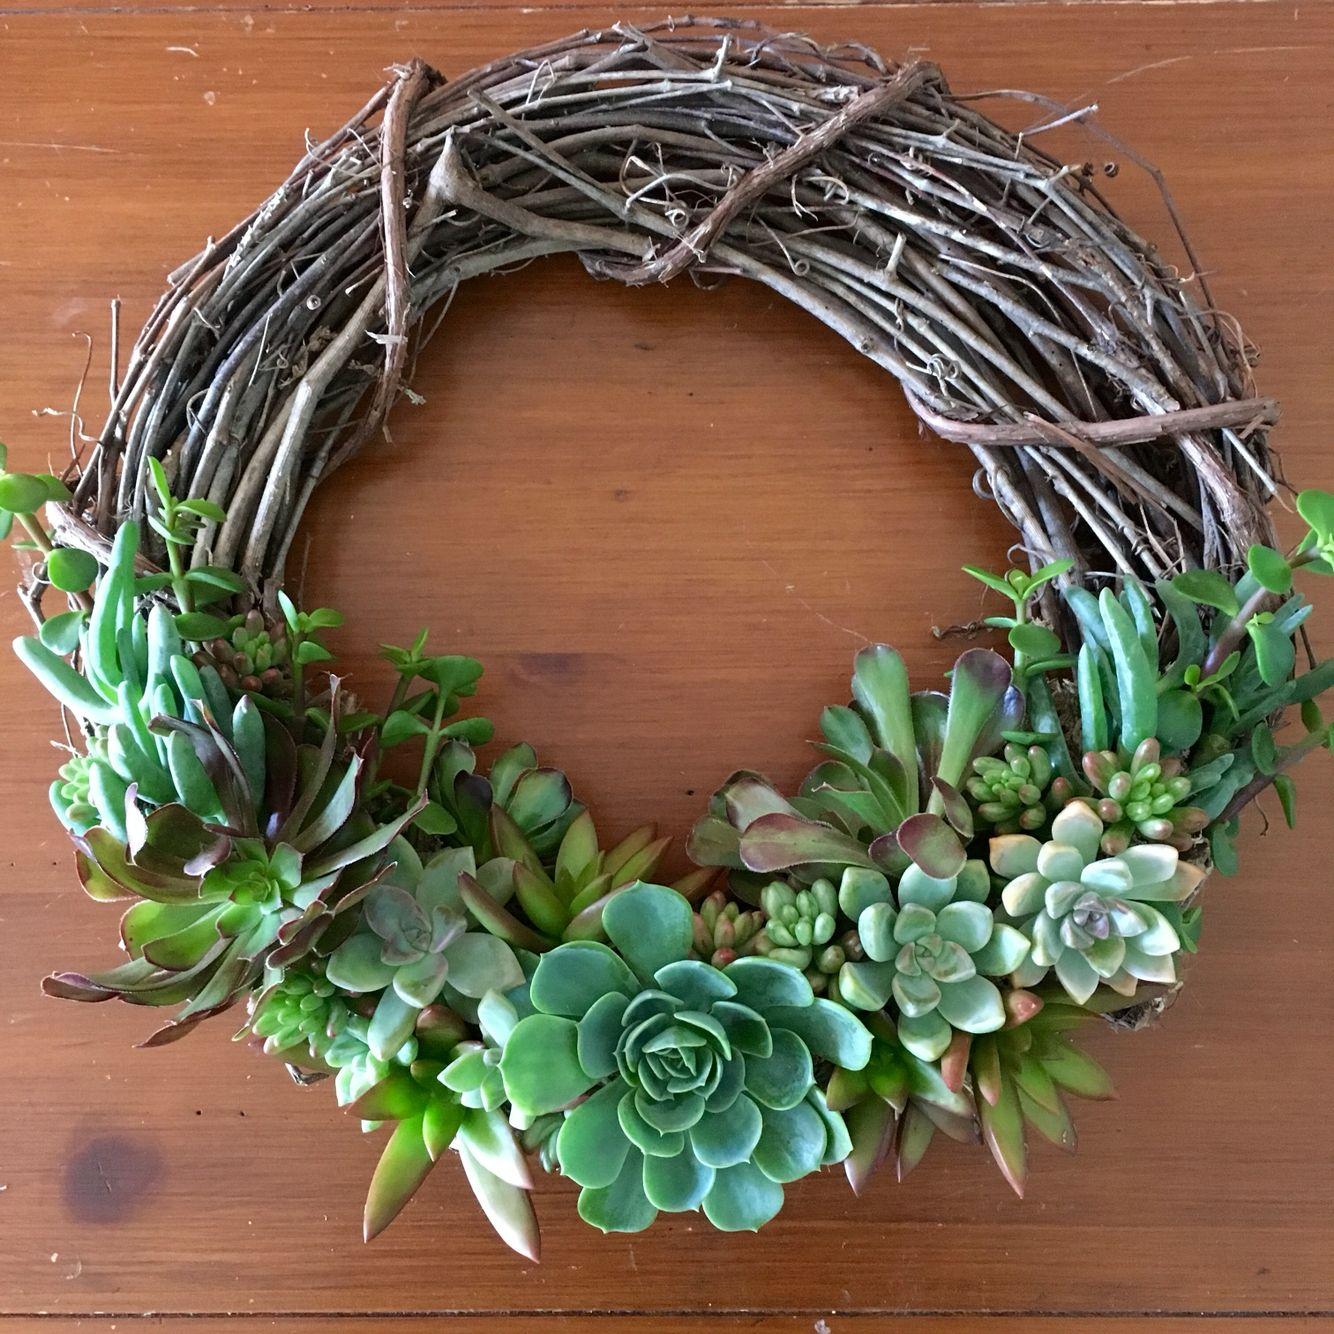 Succulents on grapevine wreath.